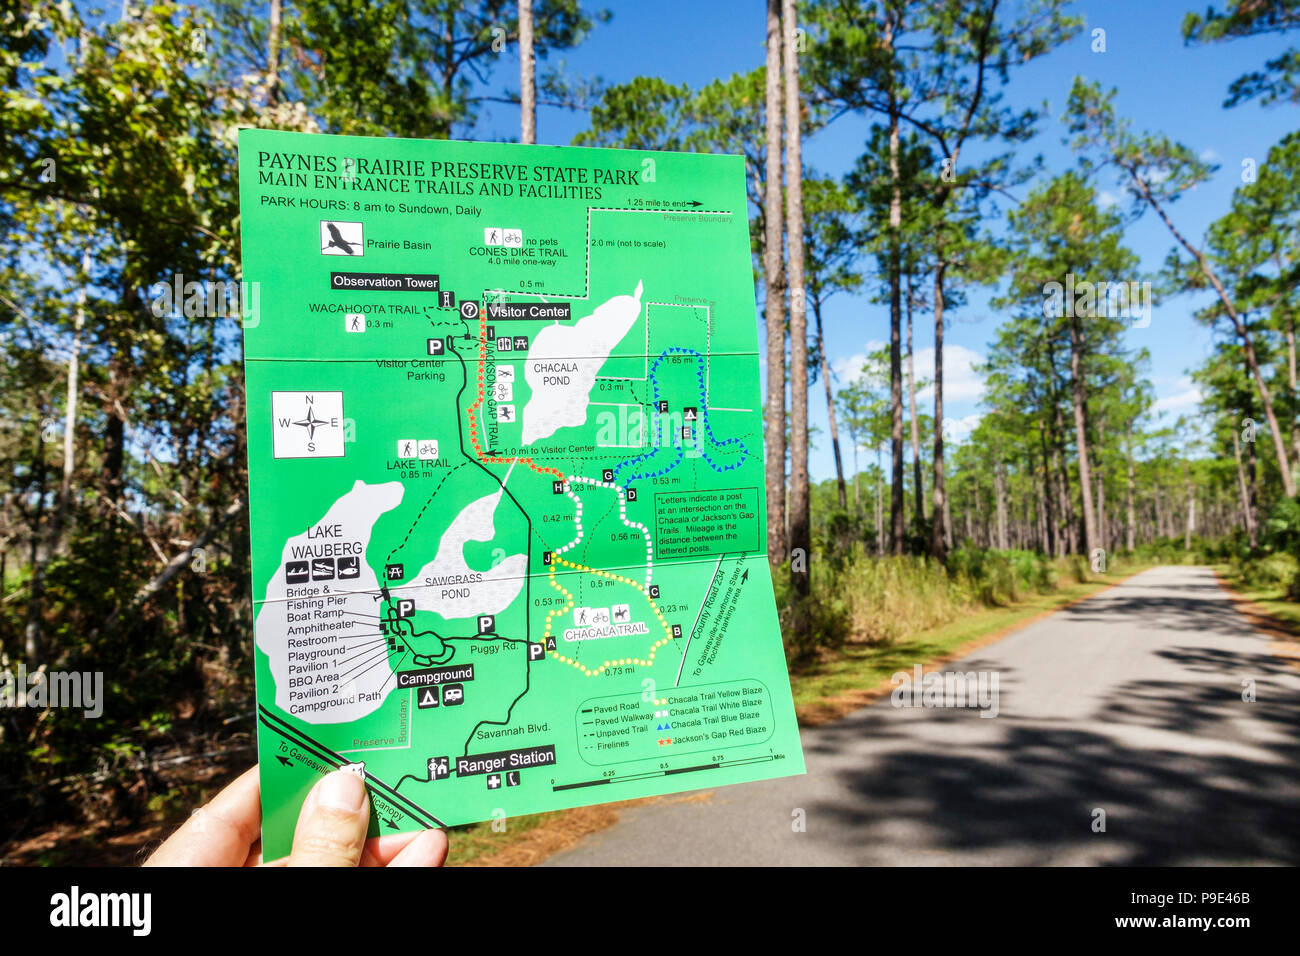 Florida Gainesville Micanopy Paynes Prairie Ecopassage Nature Preserve State Park map guide folder National Natural Landmark conservation restoration - Stock Image